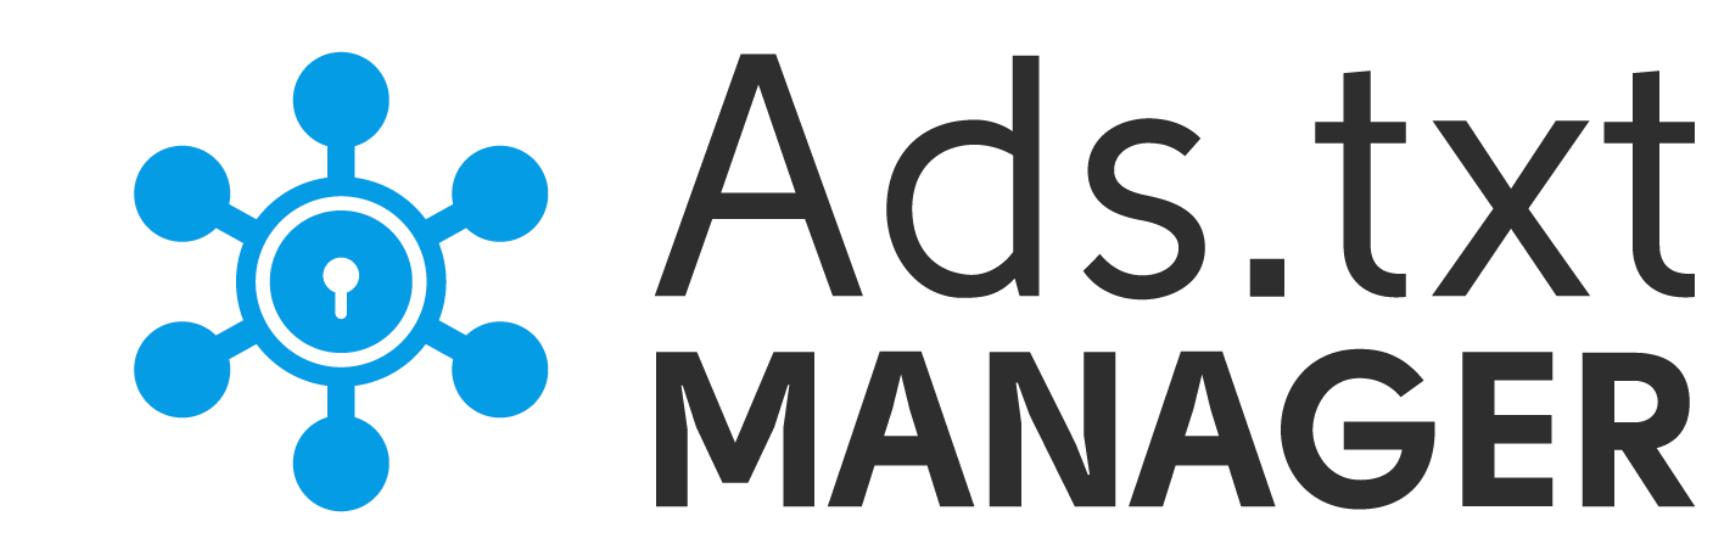 Ads.txt Manager插件